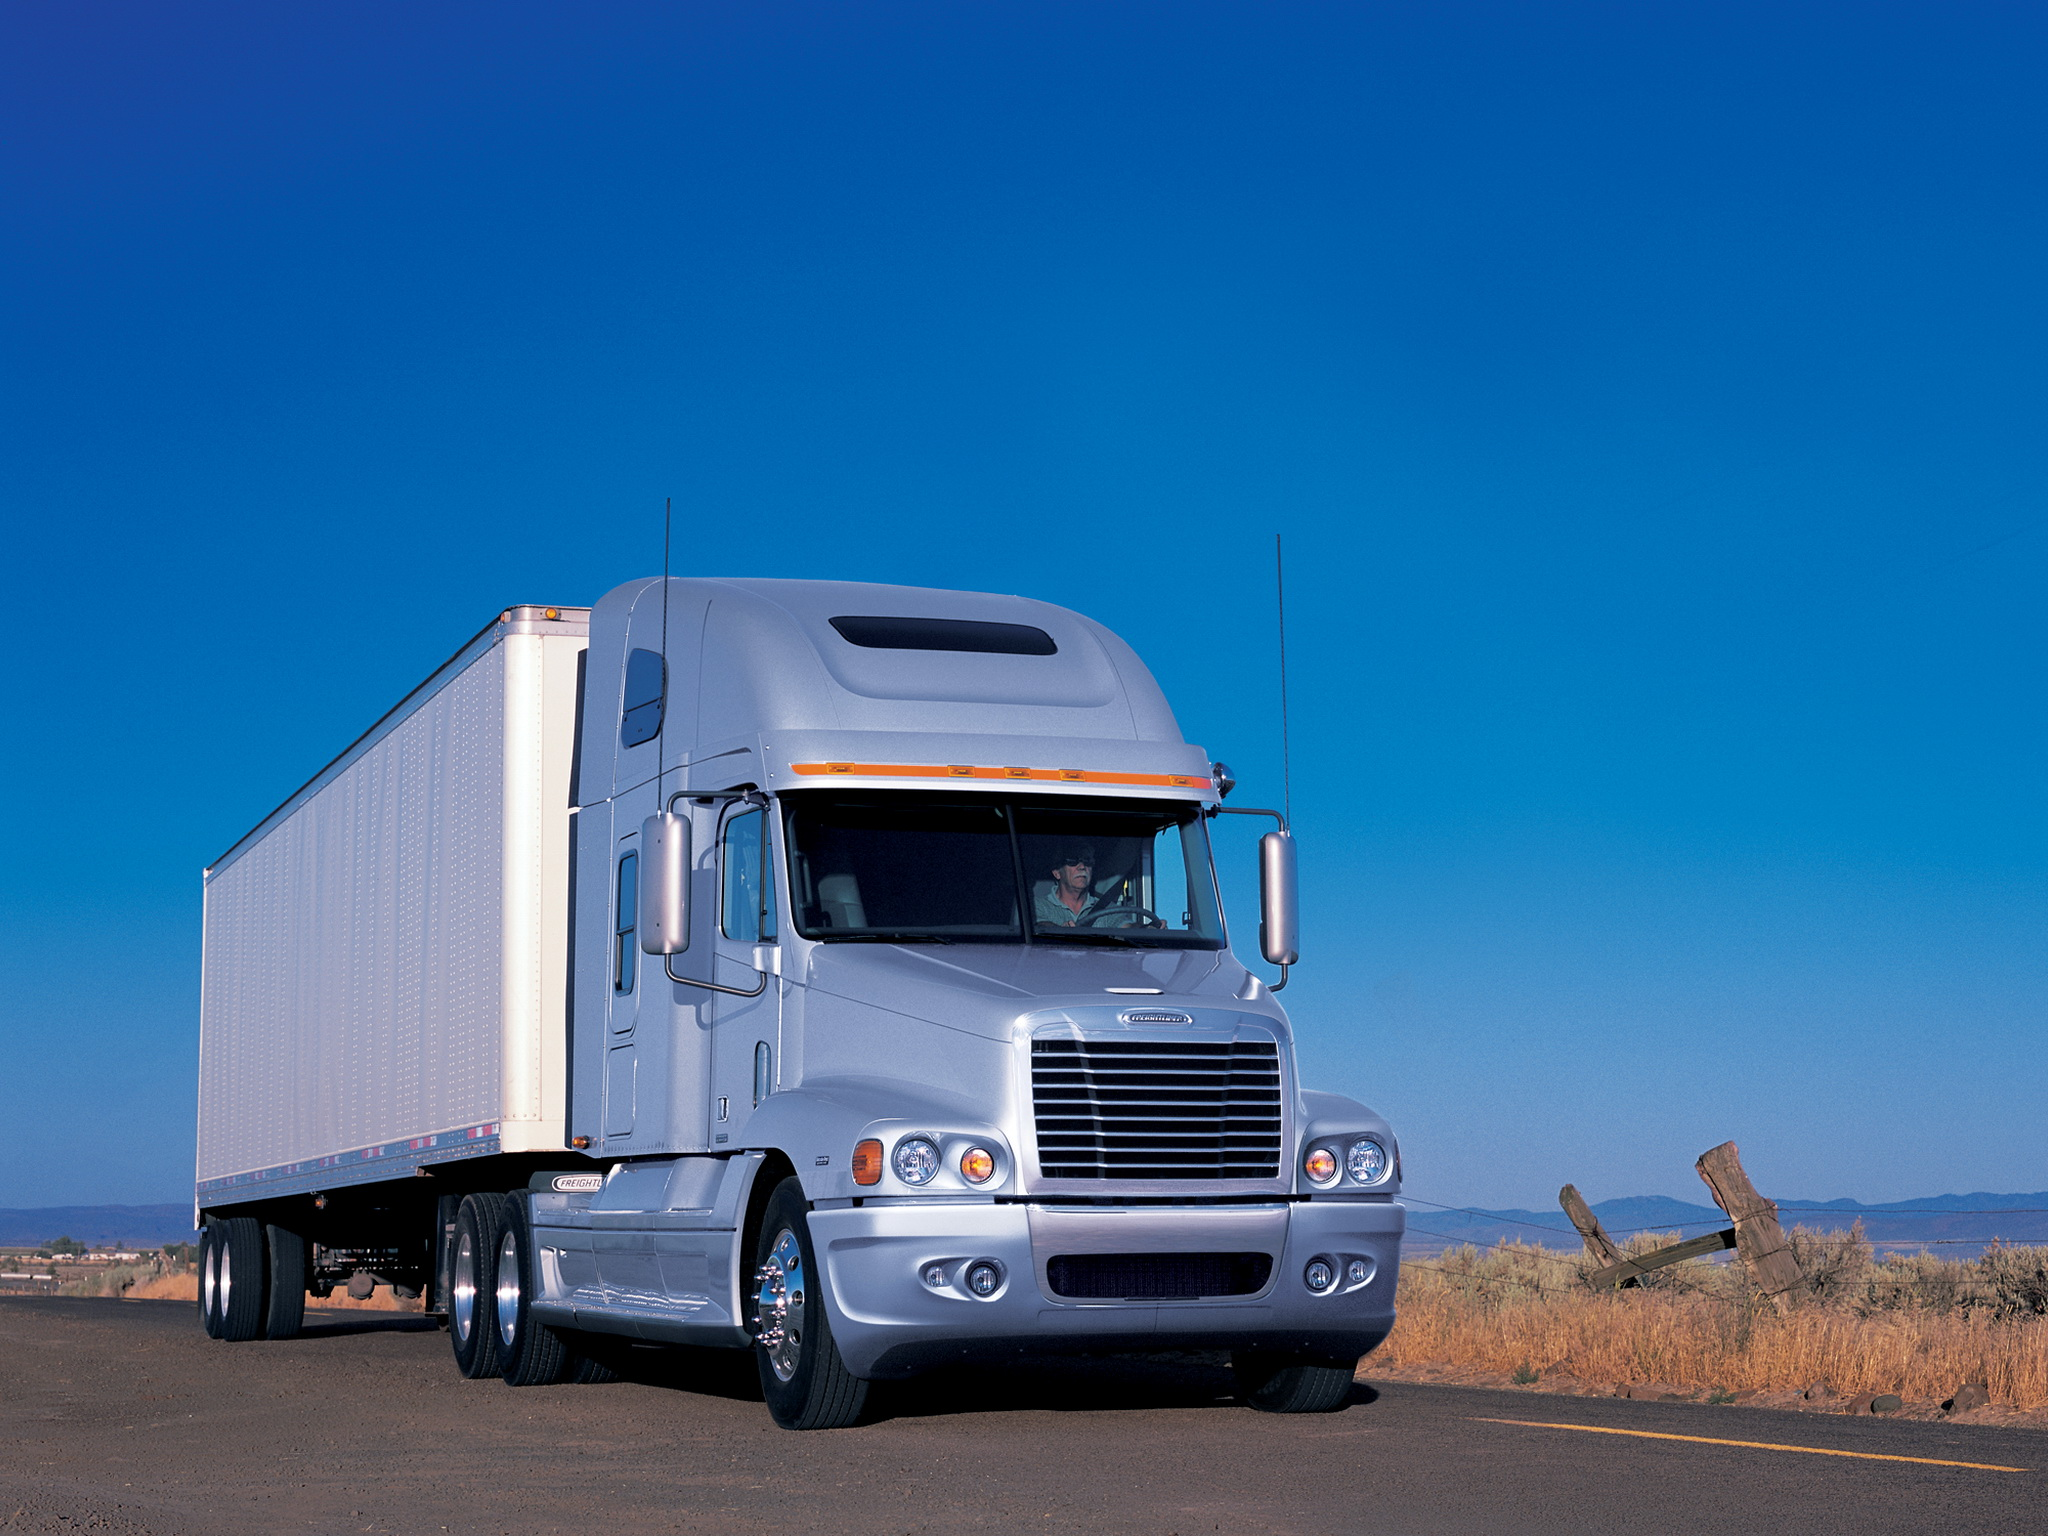 1995 Freightliner Tractor Truck Wiring Diagram Century Class Raised Roof Semi Wallpaper Wallpaperup 2048x1536